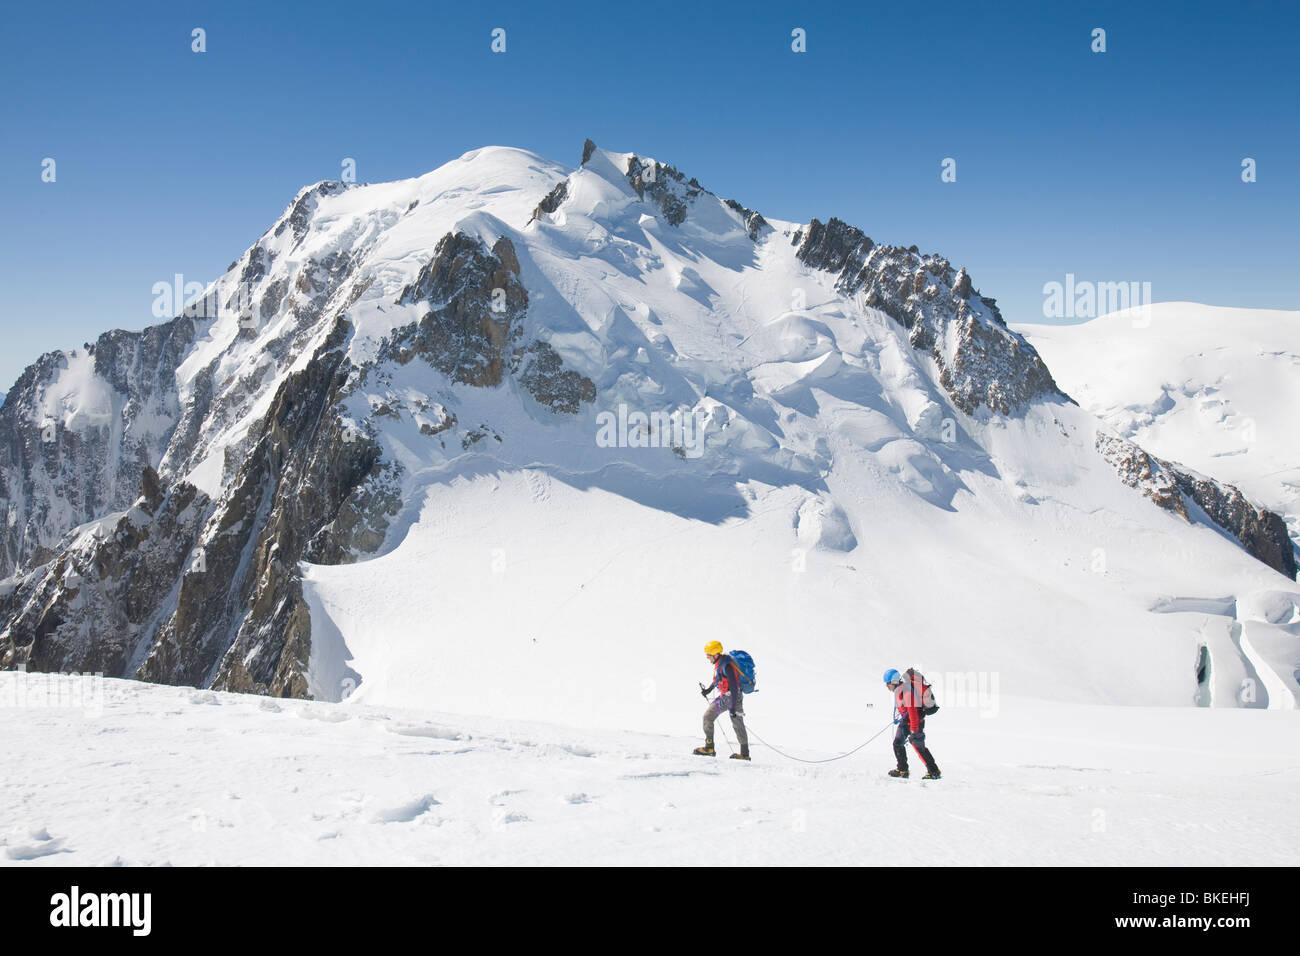 Climbers nearing the summit of the 4000 metre peak of Mont Blanc Du Tacul above Chamonix France Stock Photo